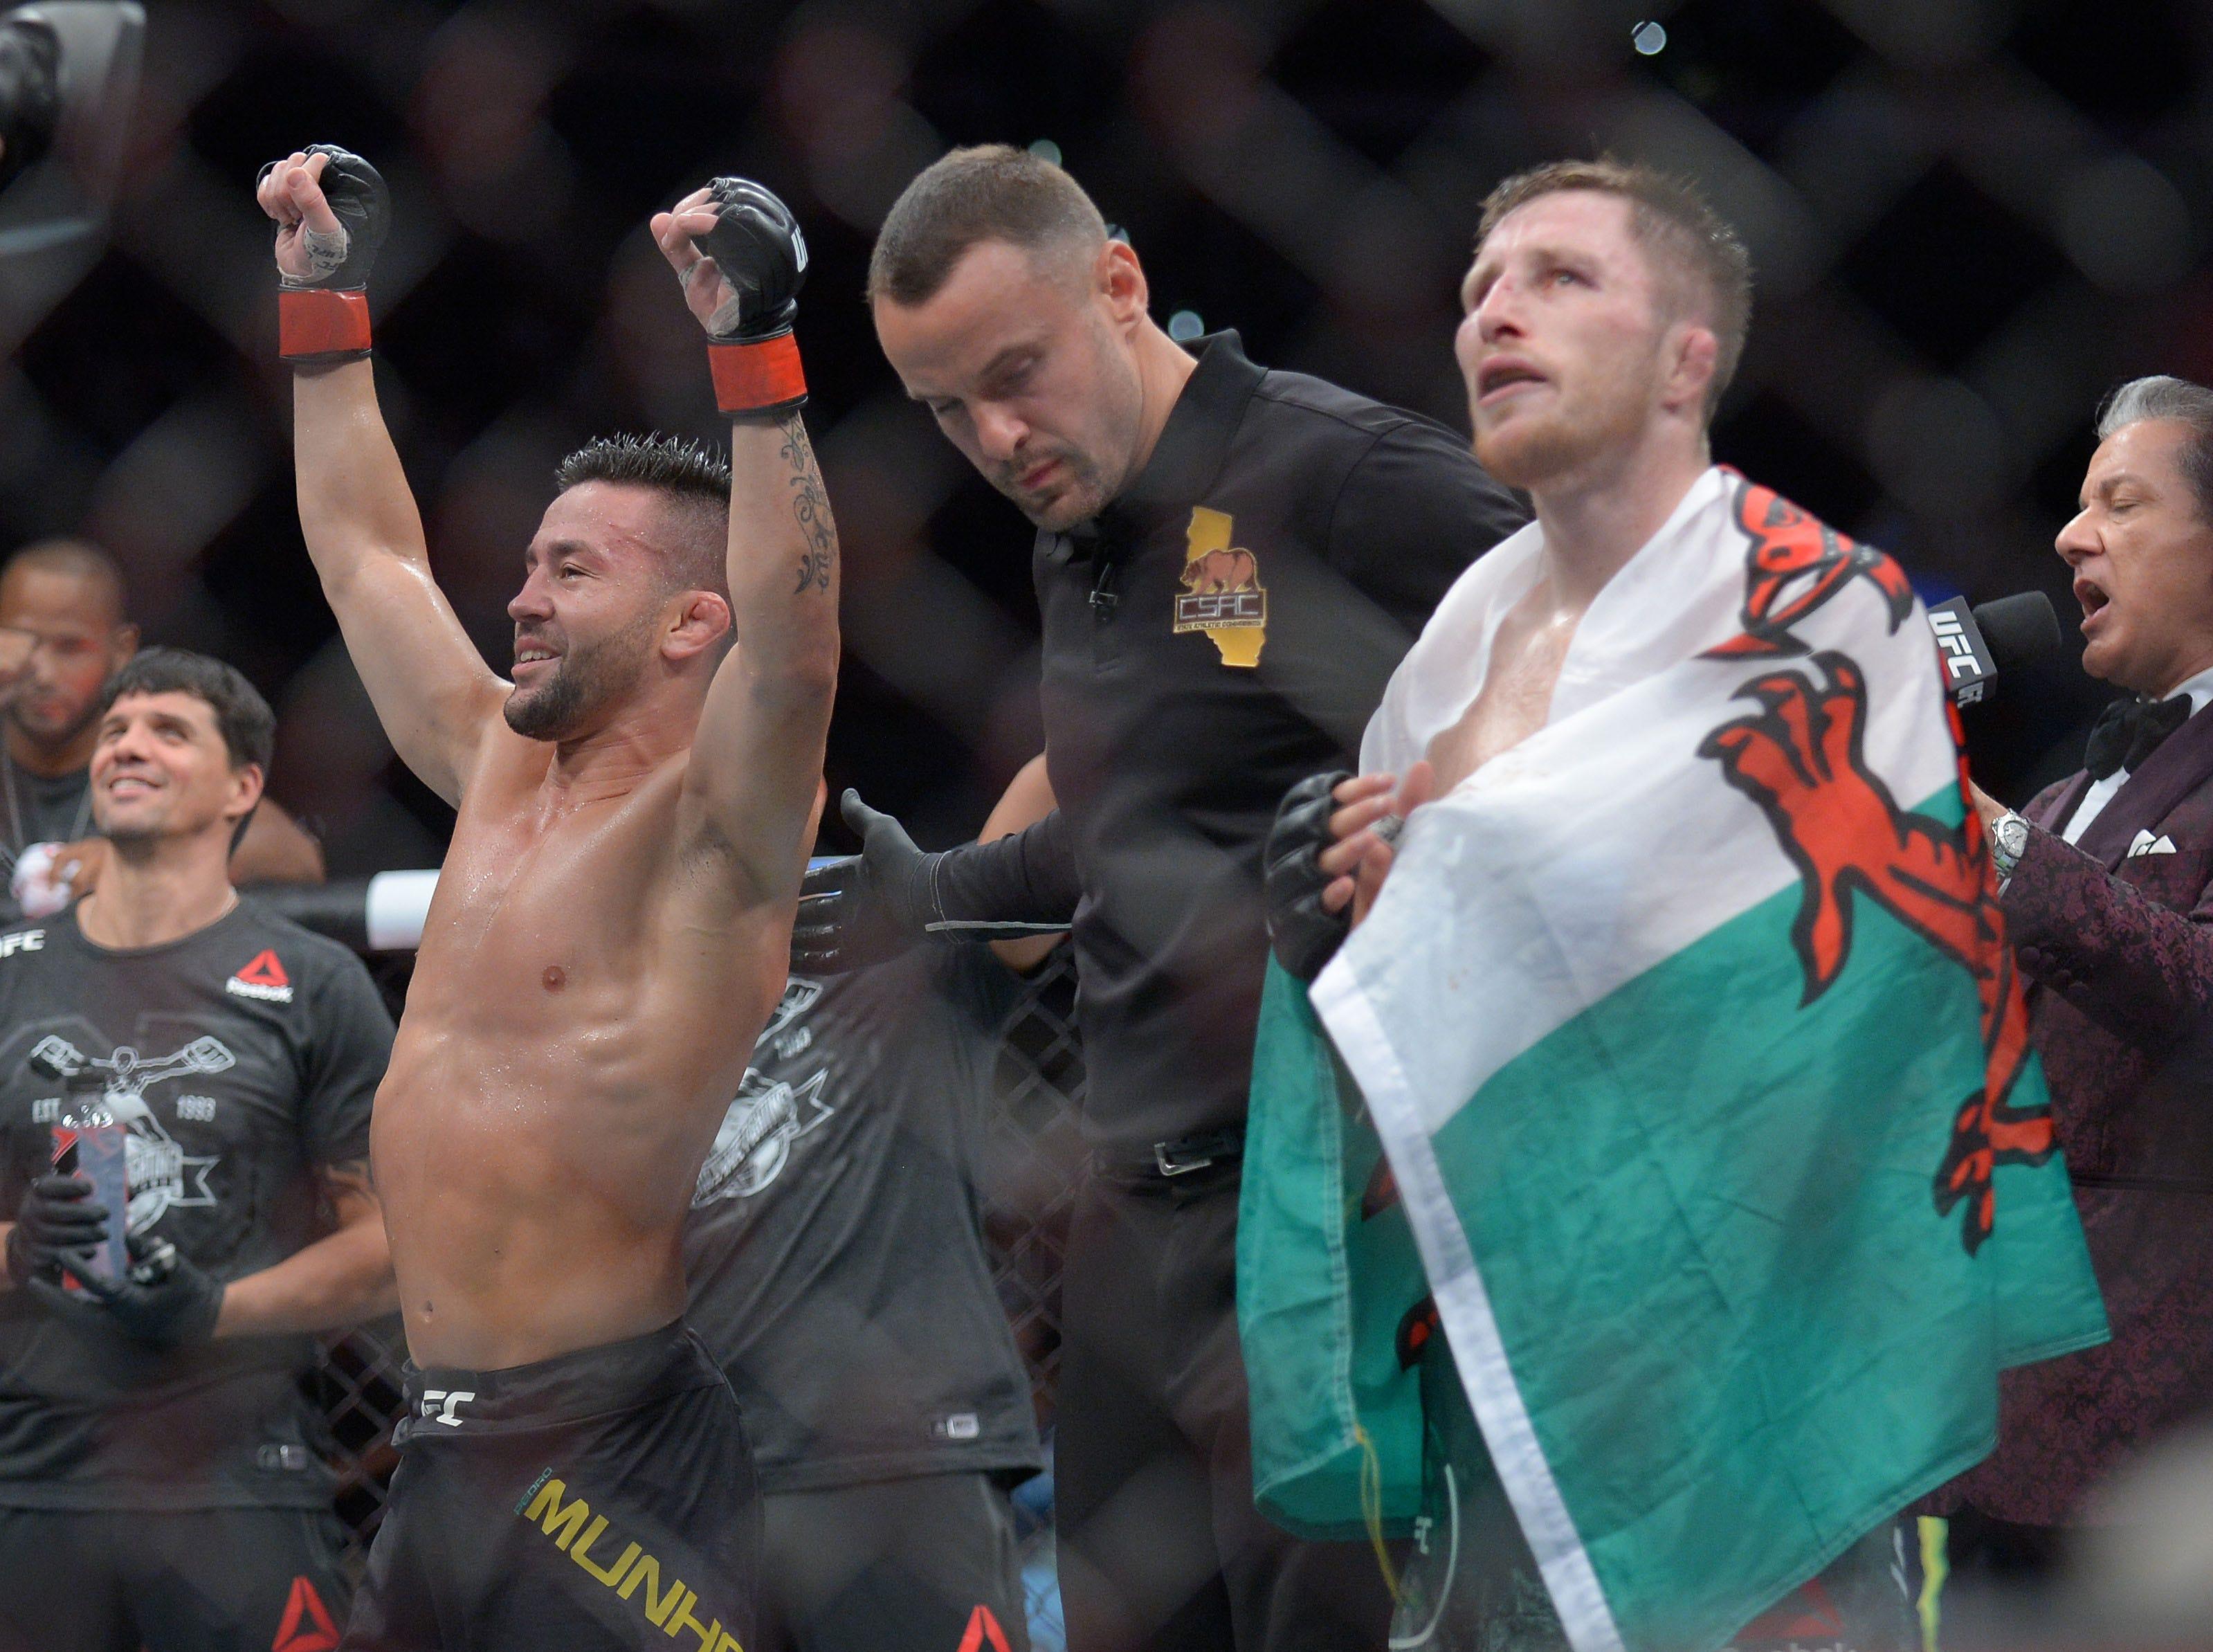 Pedro Munhoz is declared the winner against Brett Johns by decision during UFC 227 at Staples Center.